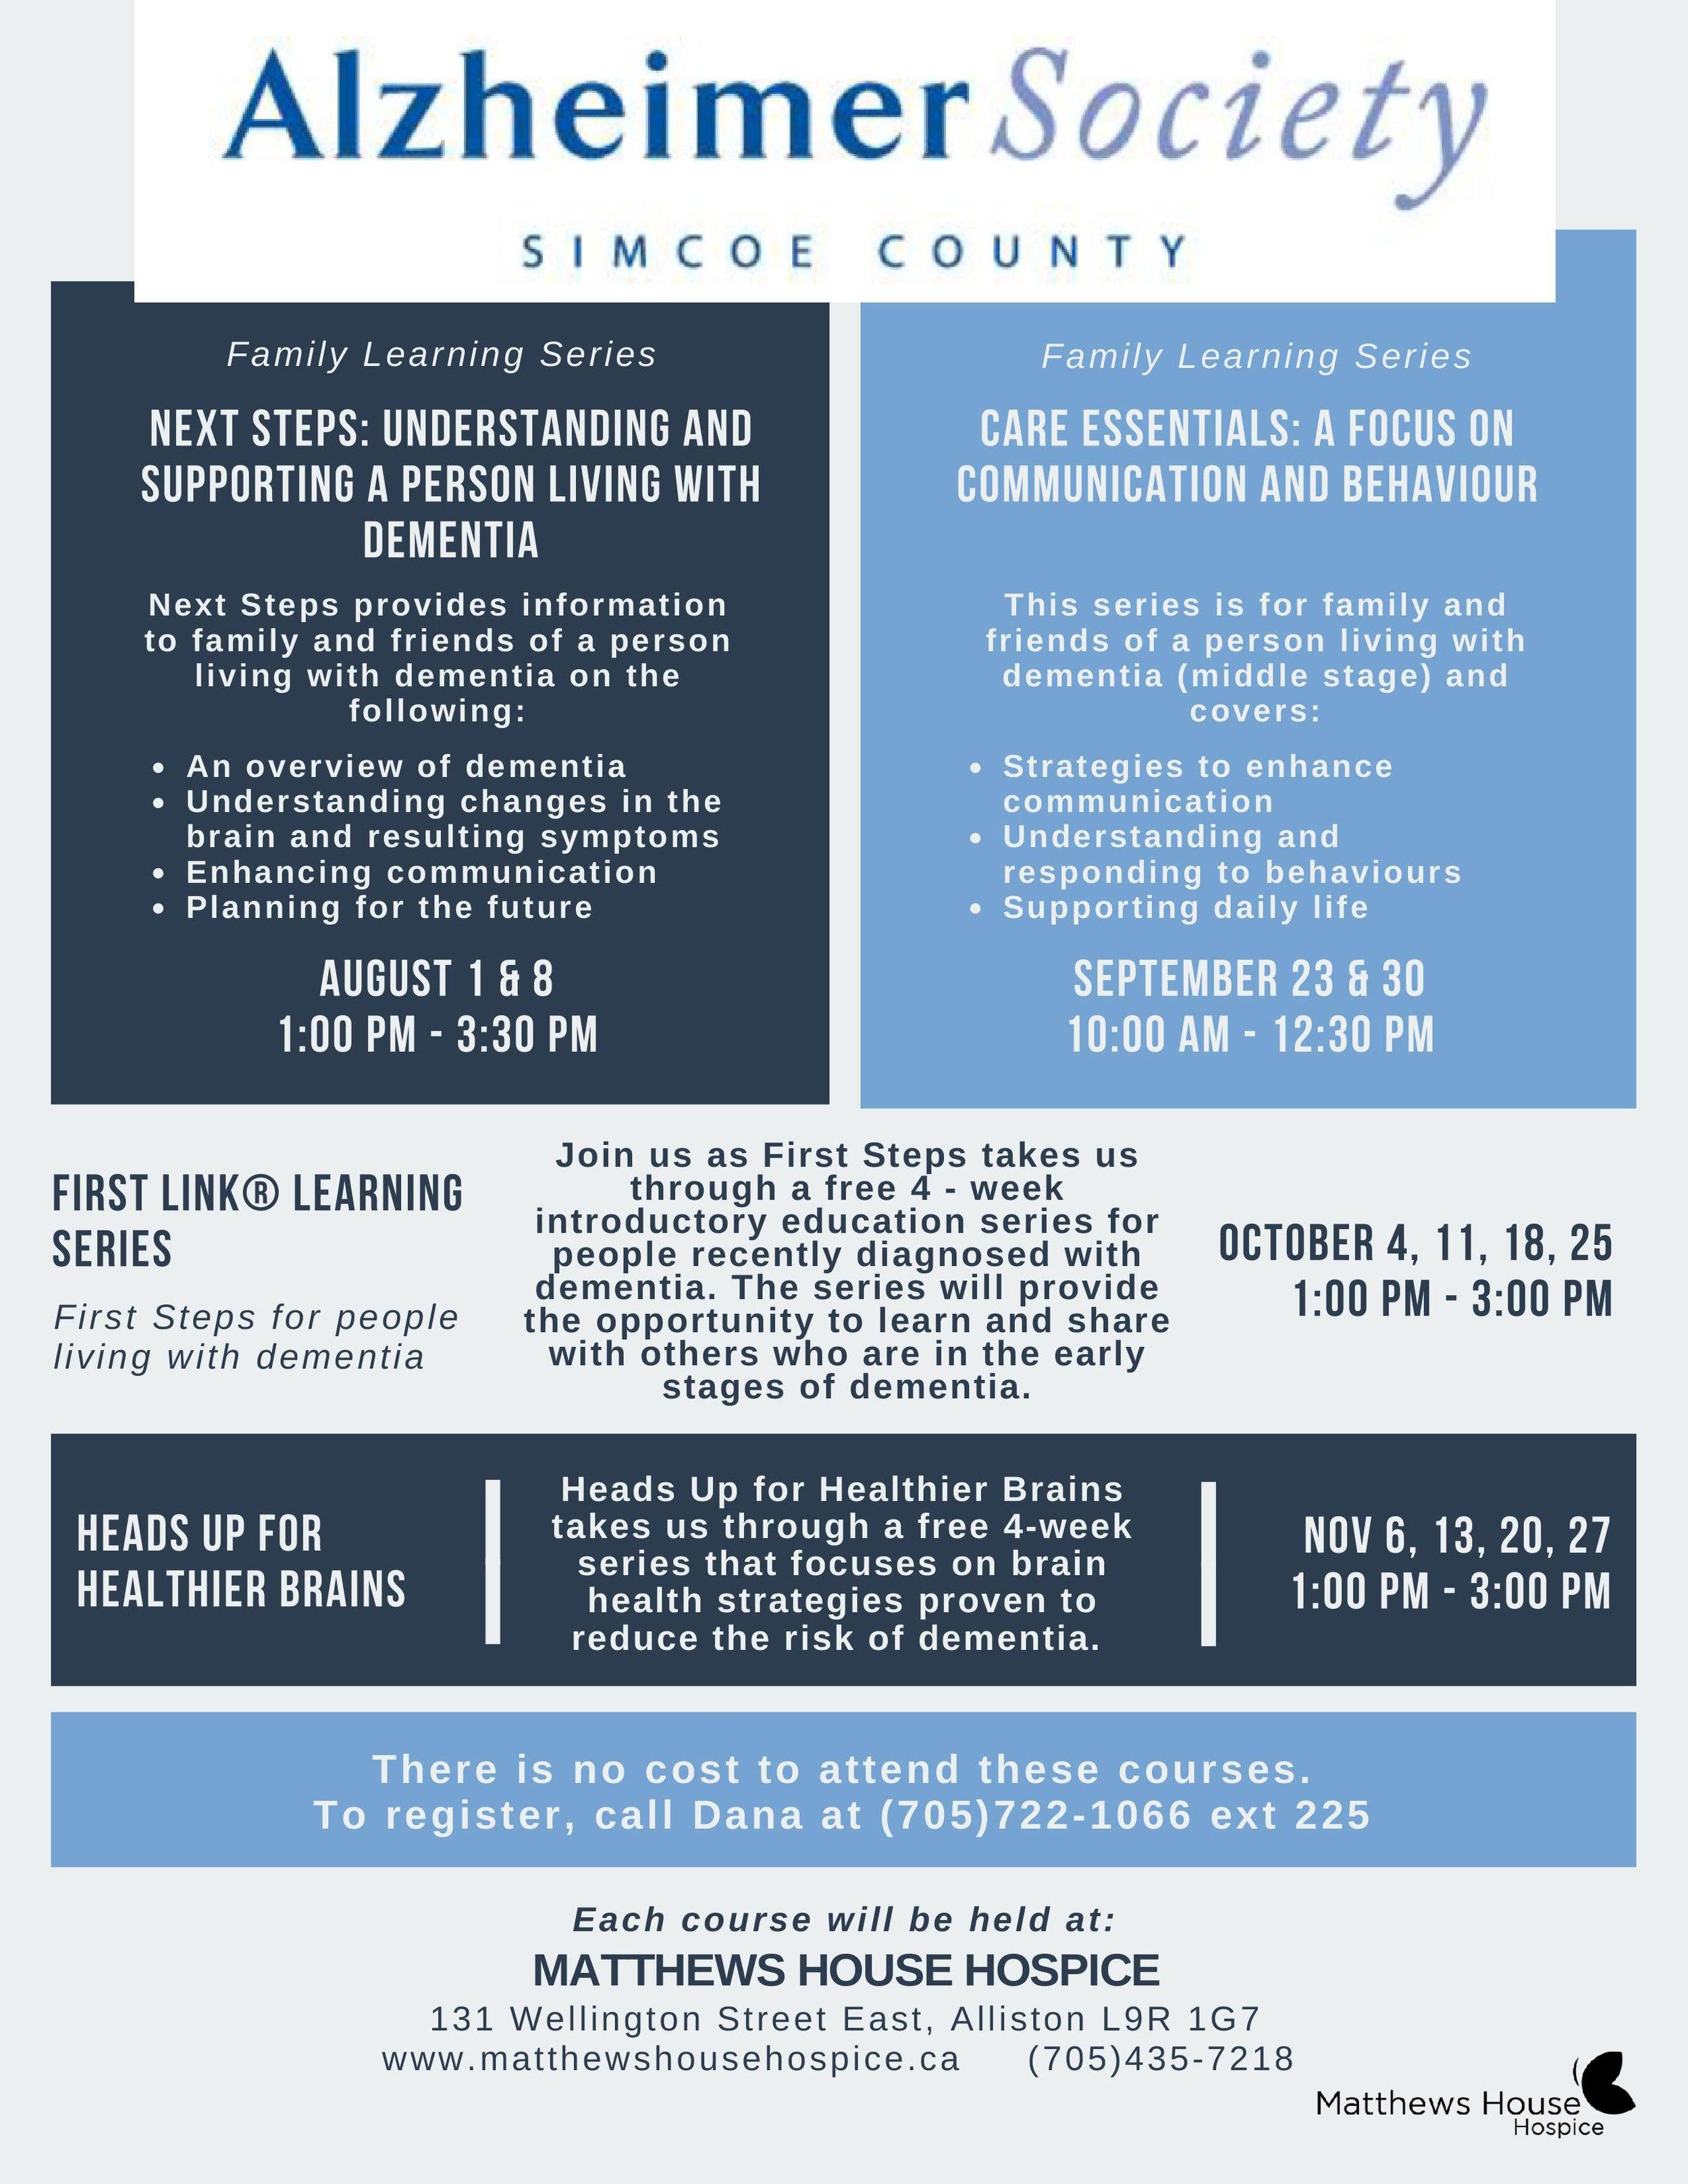 Alzheimer Society Simcoe County Programs.jpg